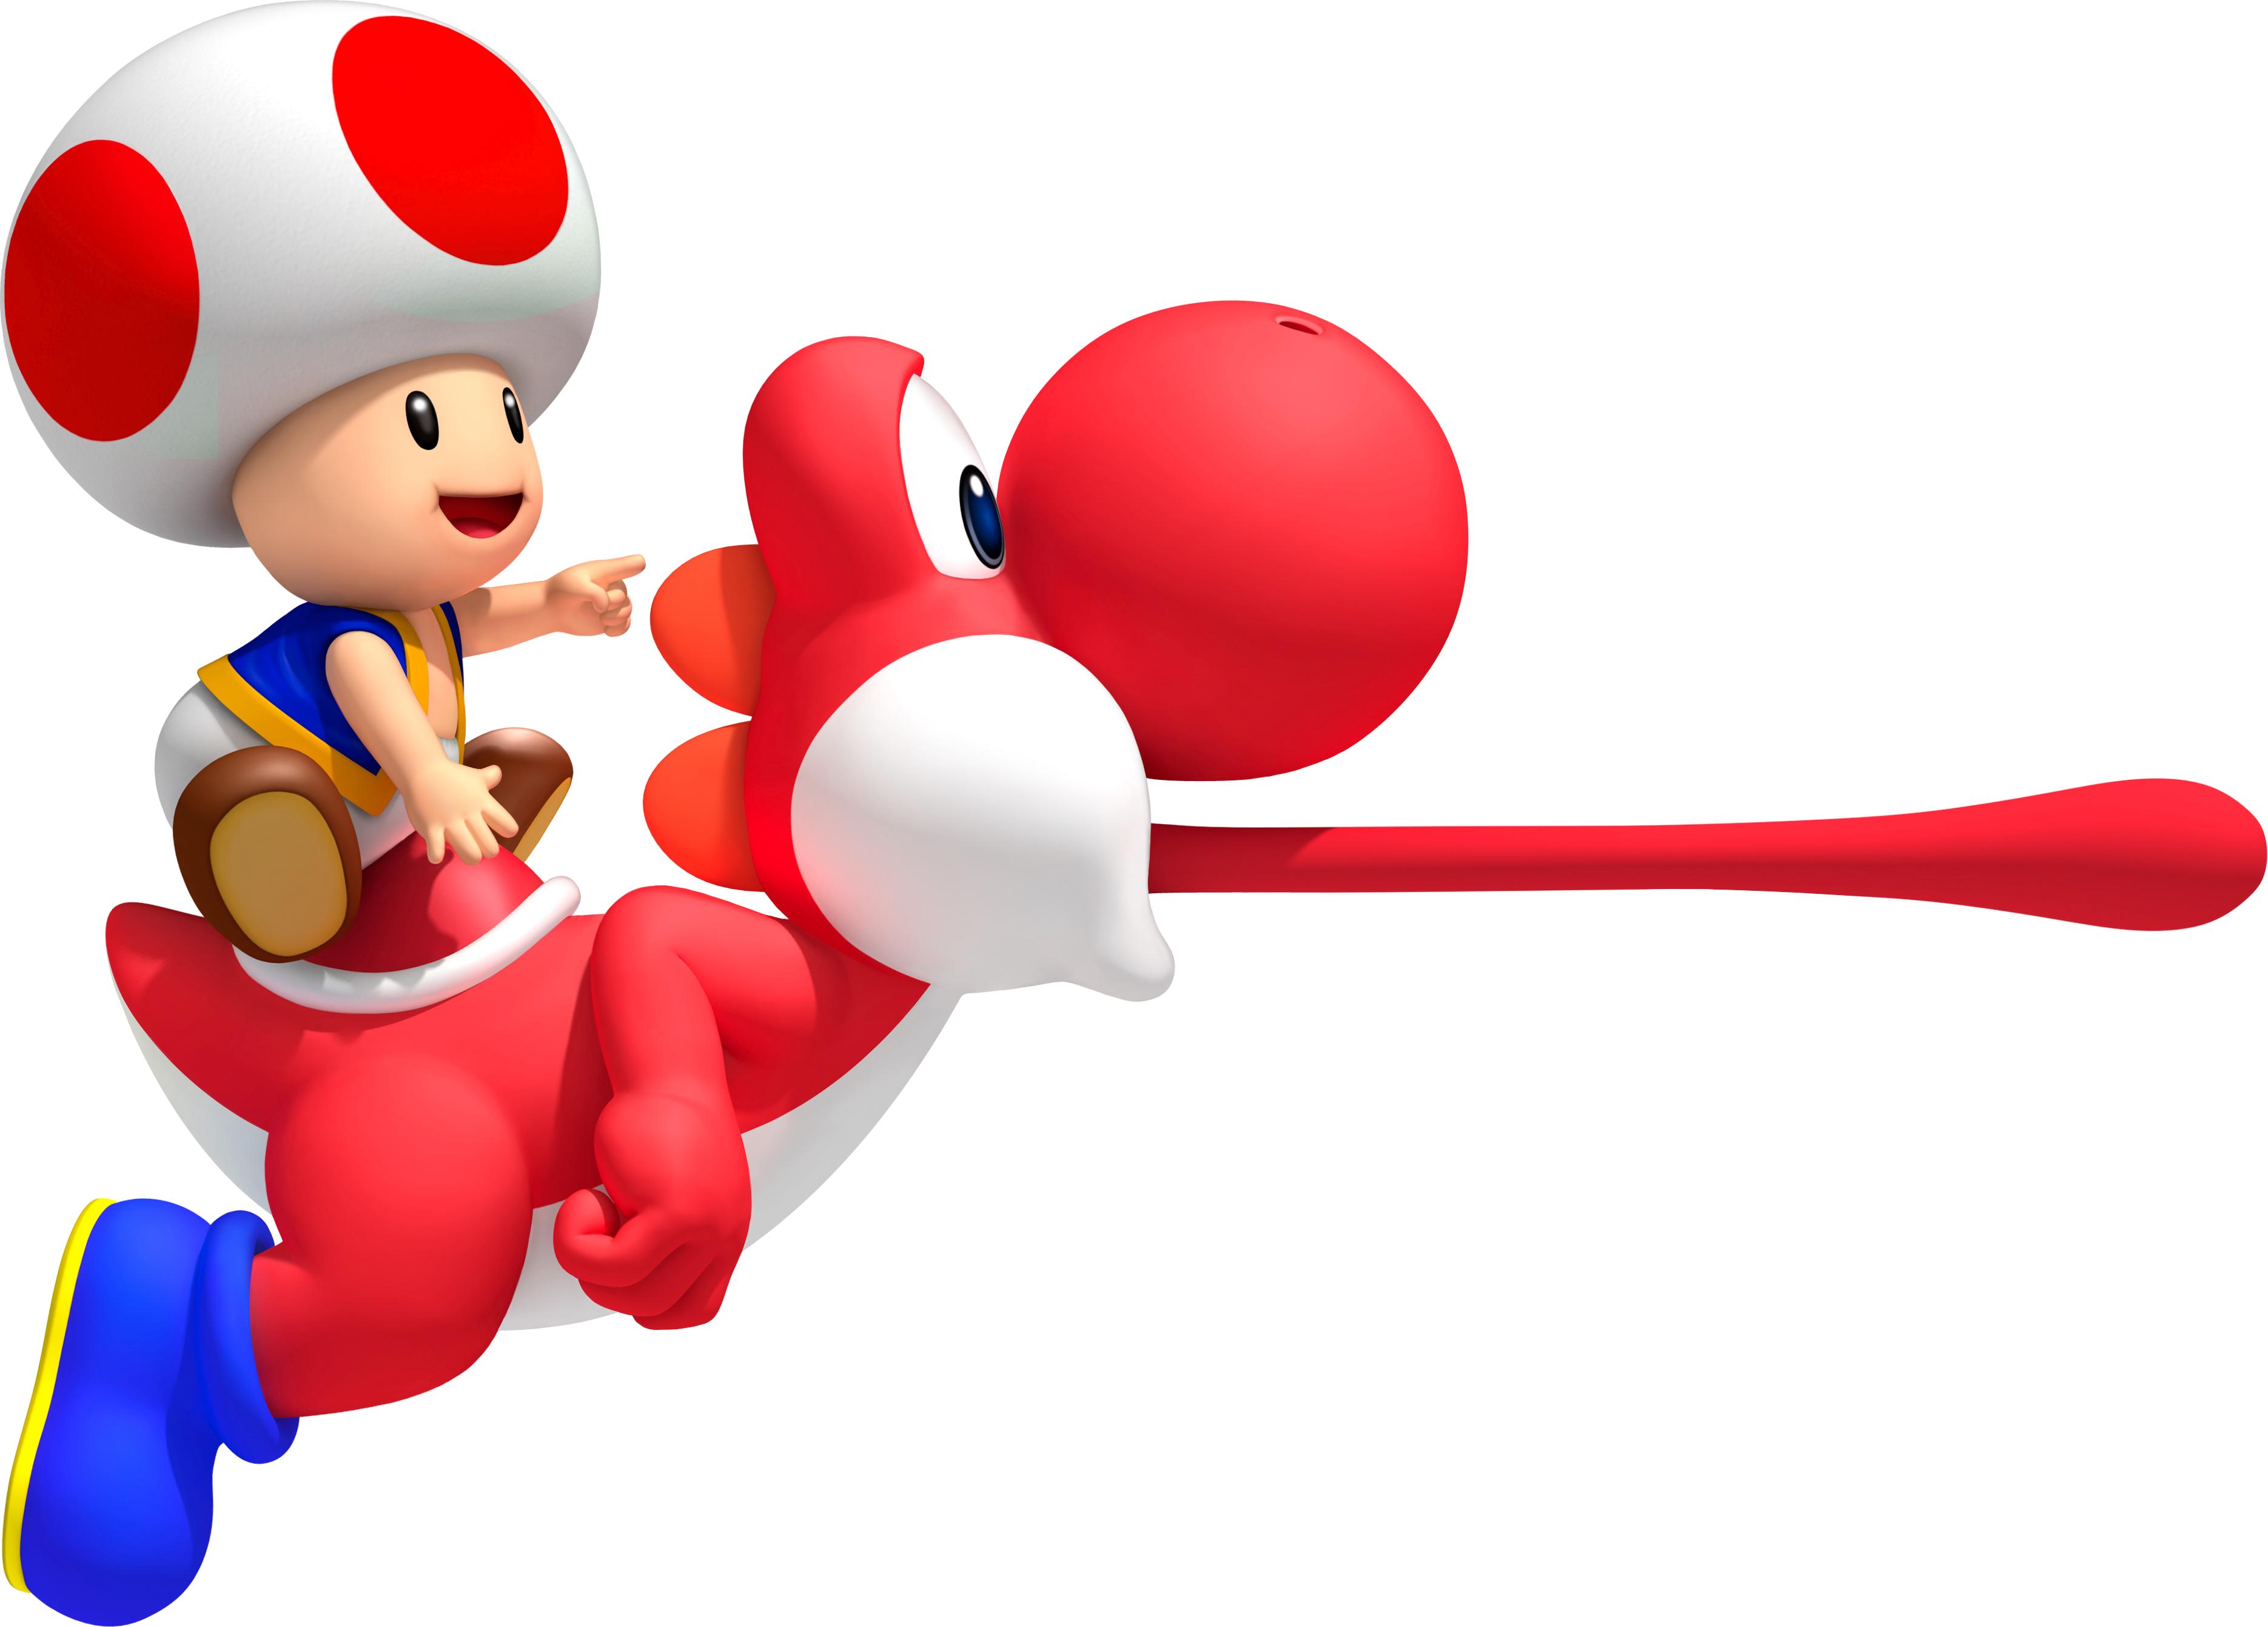 Red Yoshi.png - Fantendo, the Nintendo Fanon Wiki - Nintendo, Nintendo